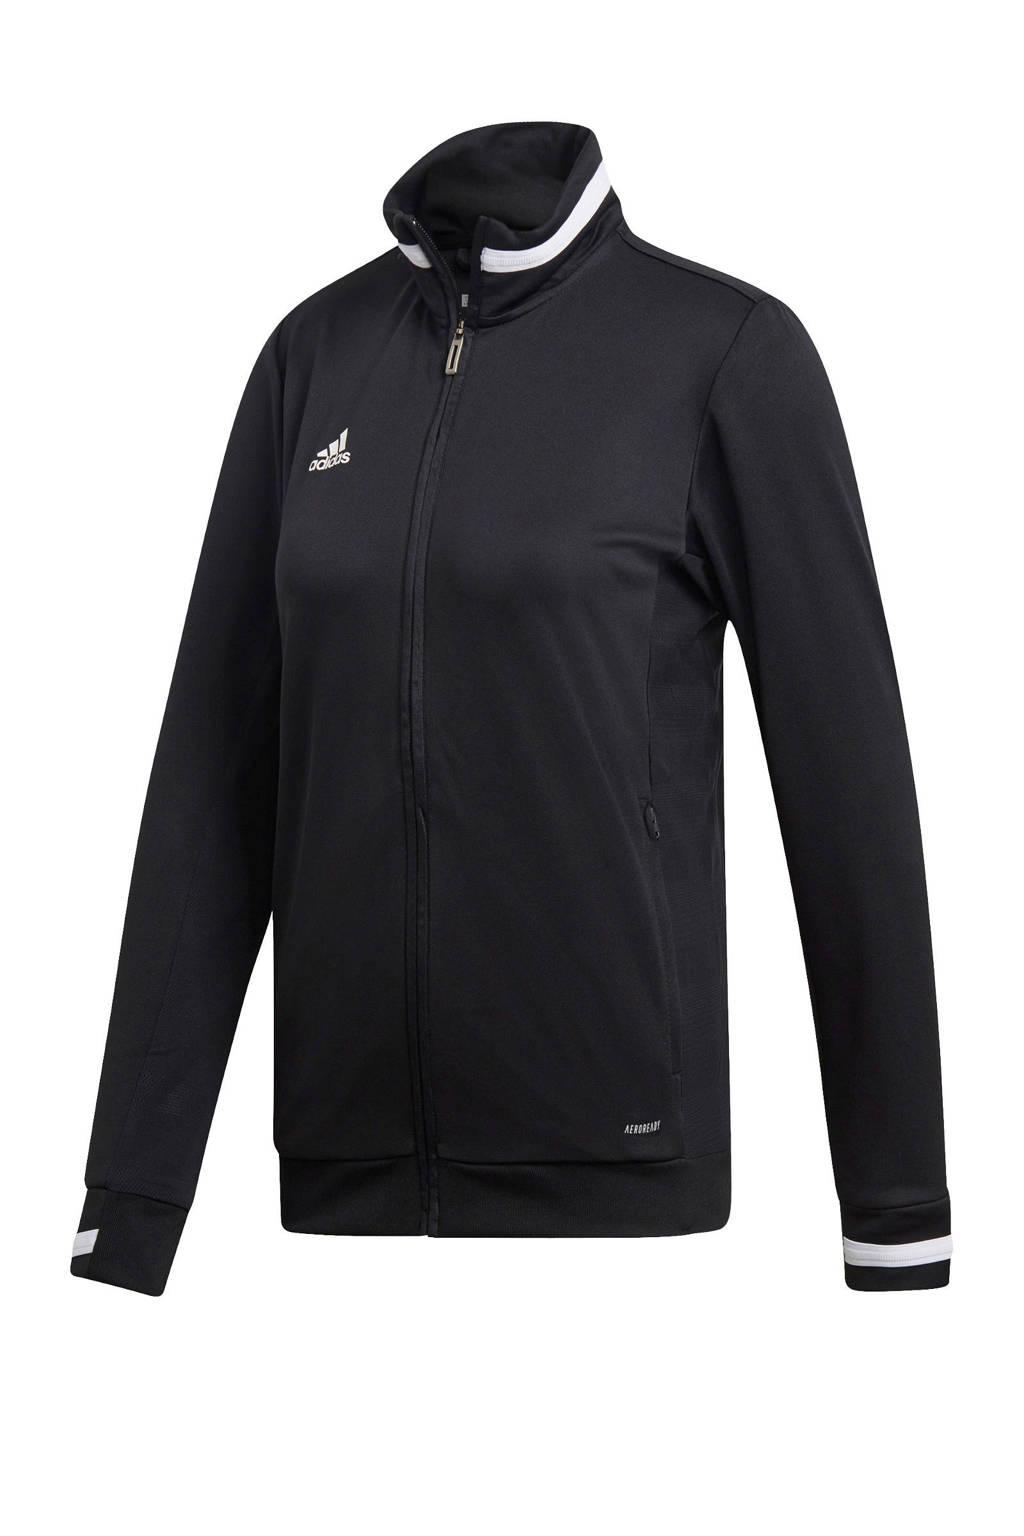 adidas performance performance sportvest zwart, Zwart